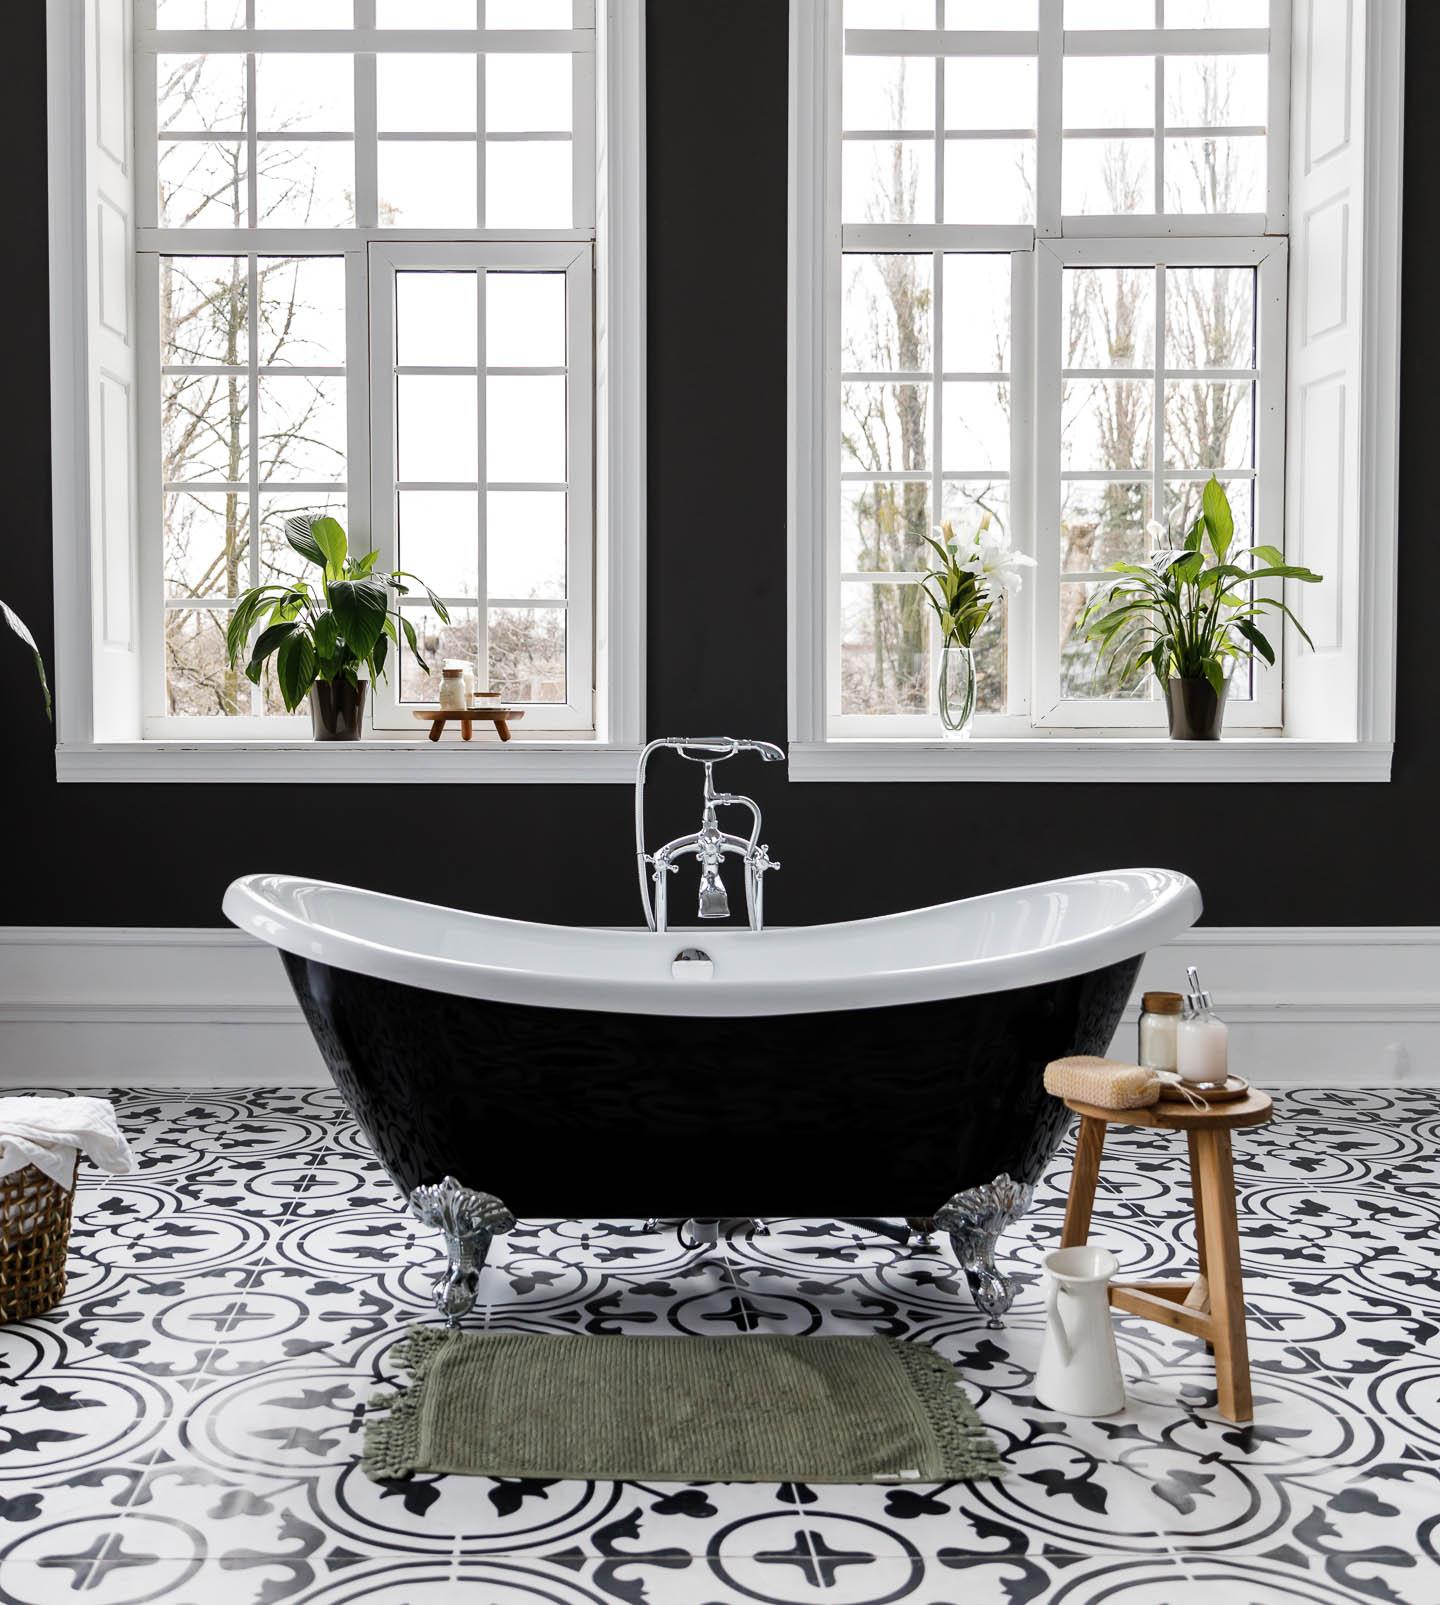 White Bathroom Floor Tile Ideas, Black And White Bathroom Floor Tile Ideas